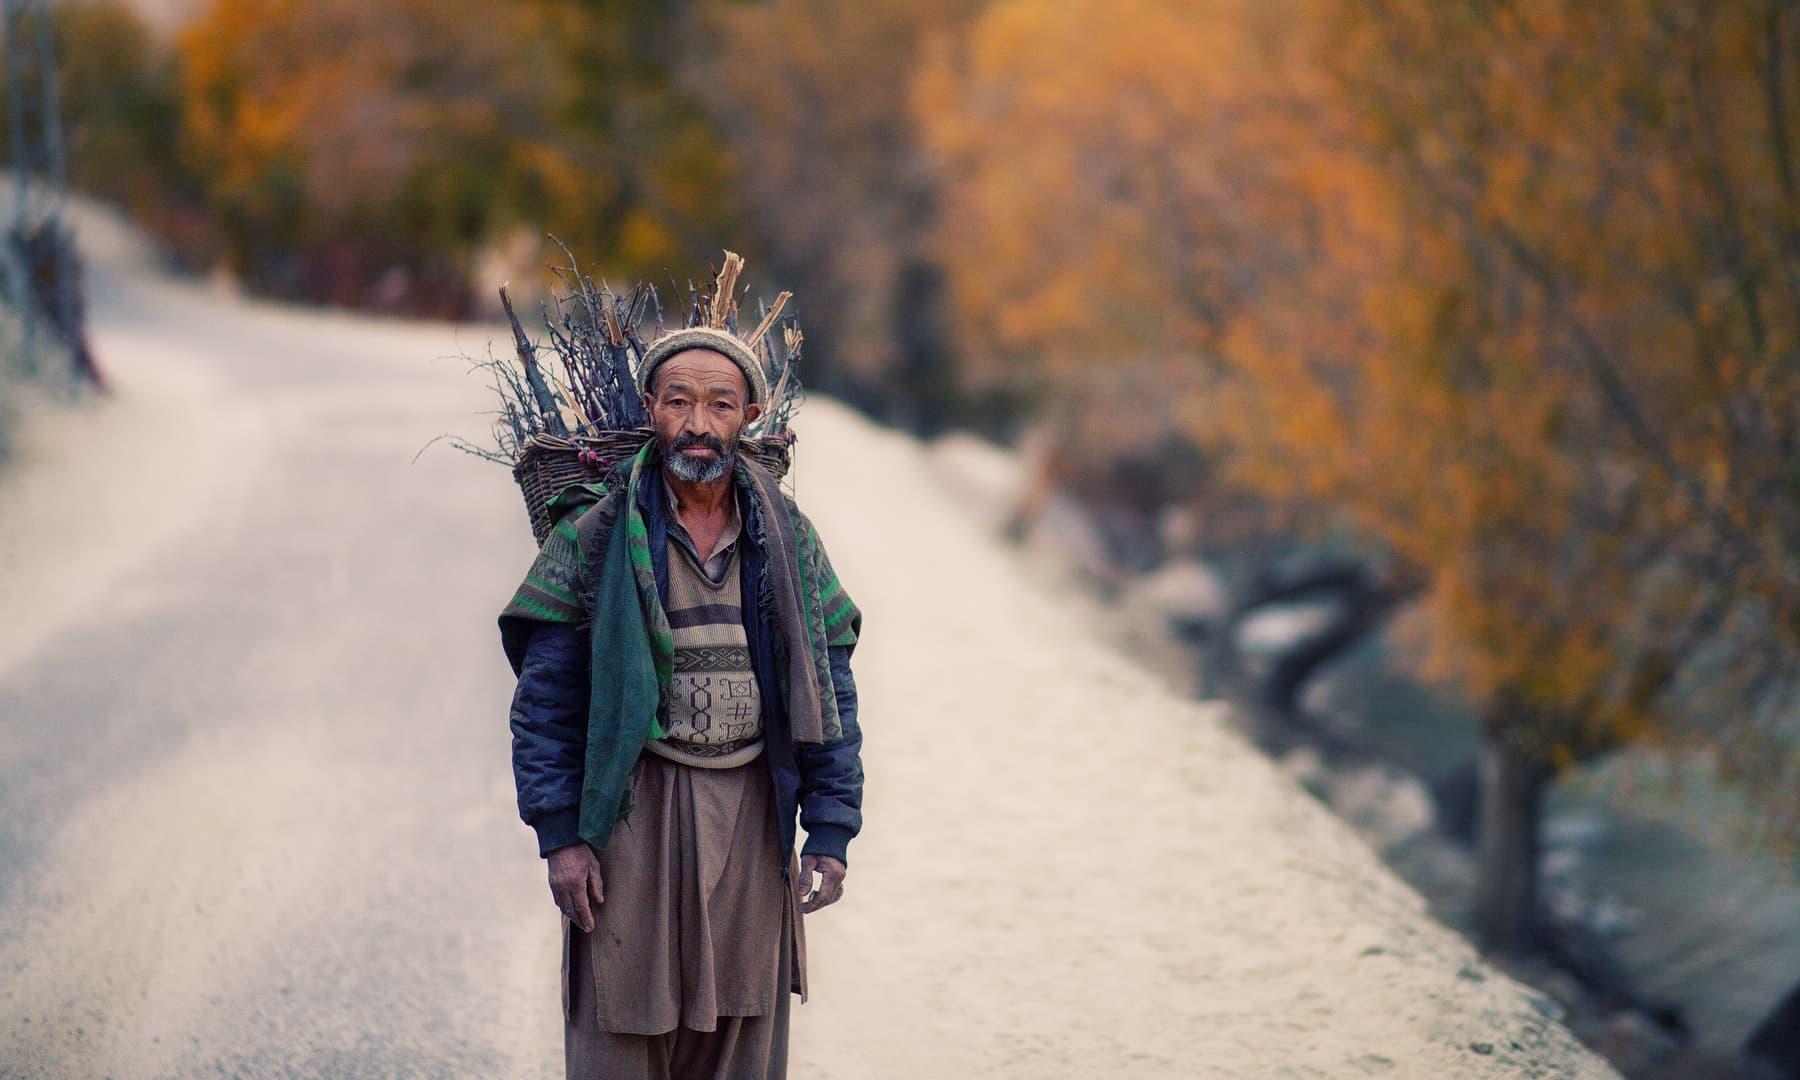 A Balti man. — S.M.Bukhari